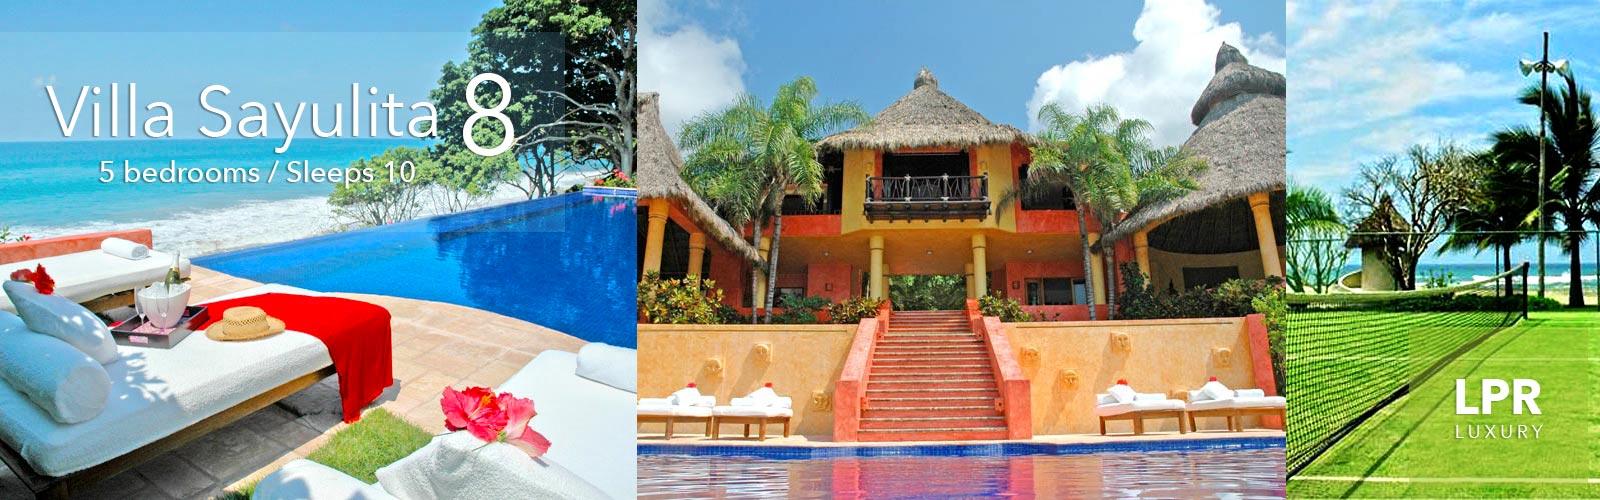 Villa Sayulita 8 - Luxury Estate on a hidden beach South of Sayulita, Riviera Nayarit, Mexico